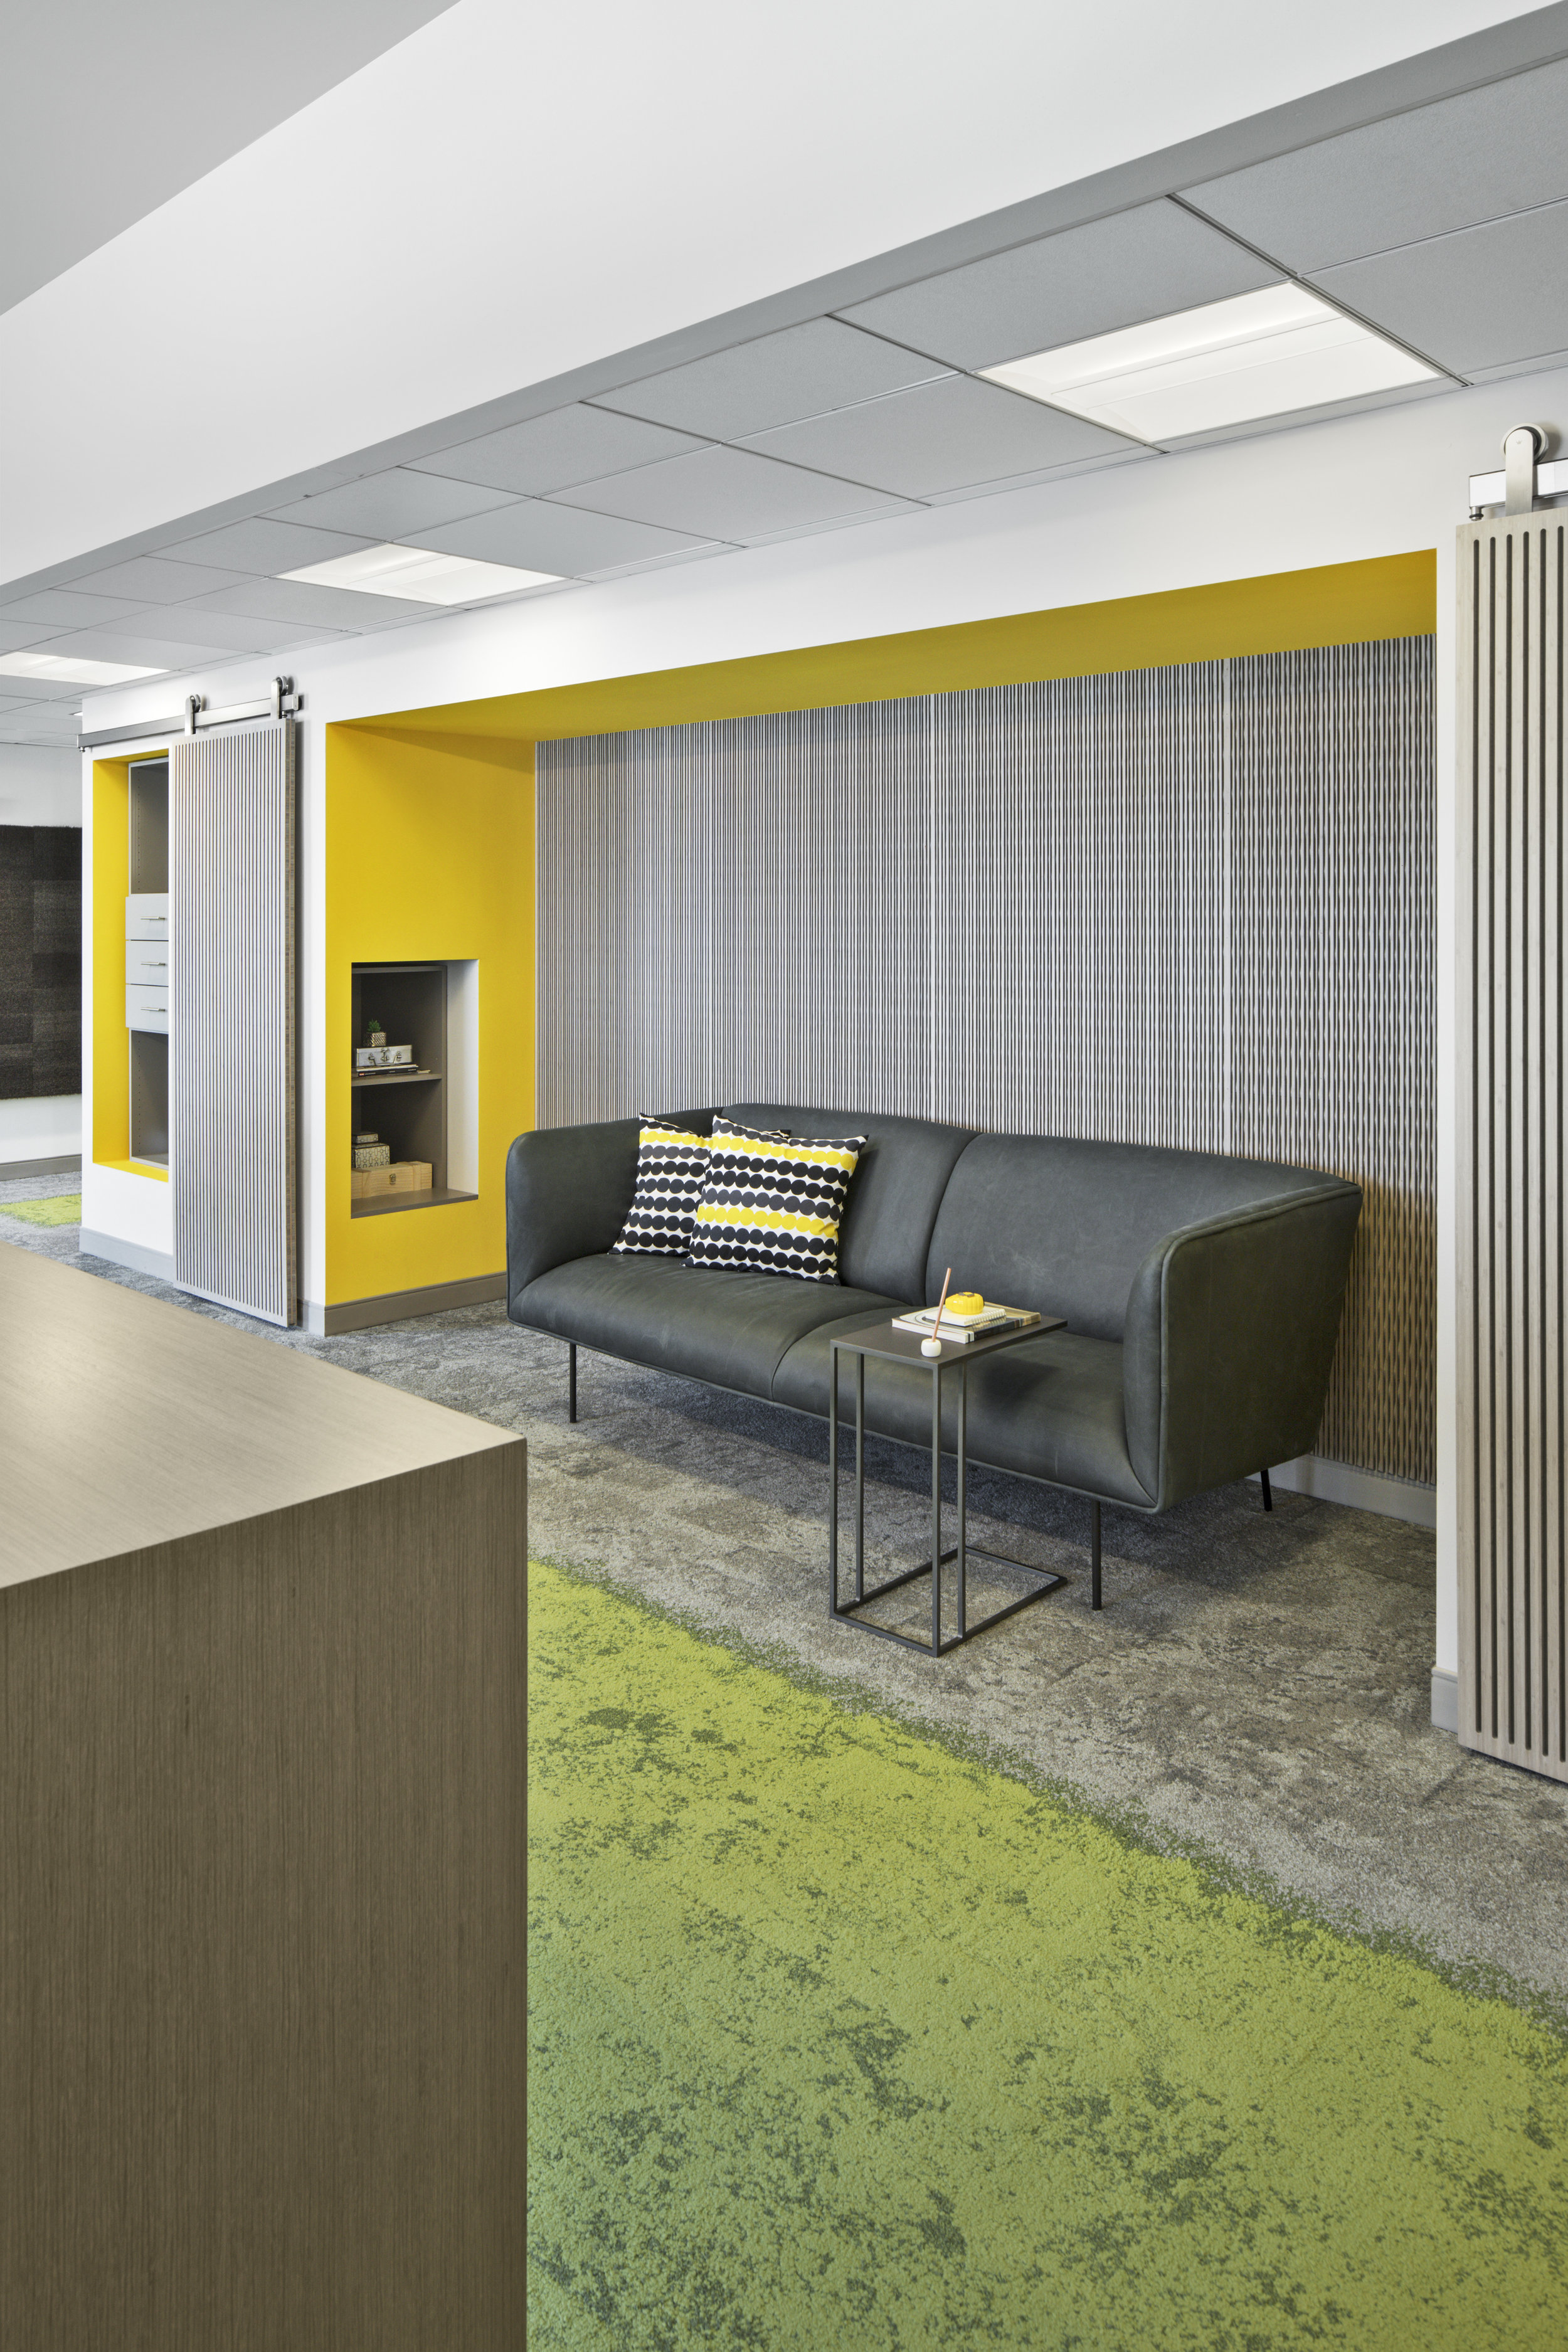 Custom-Entry-Yellow-Wall-Built-In-Display-Grey-Couch-JMorrisDesign-Brooklyn-Interior-Designer.jpg